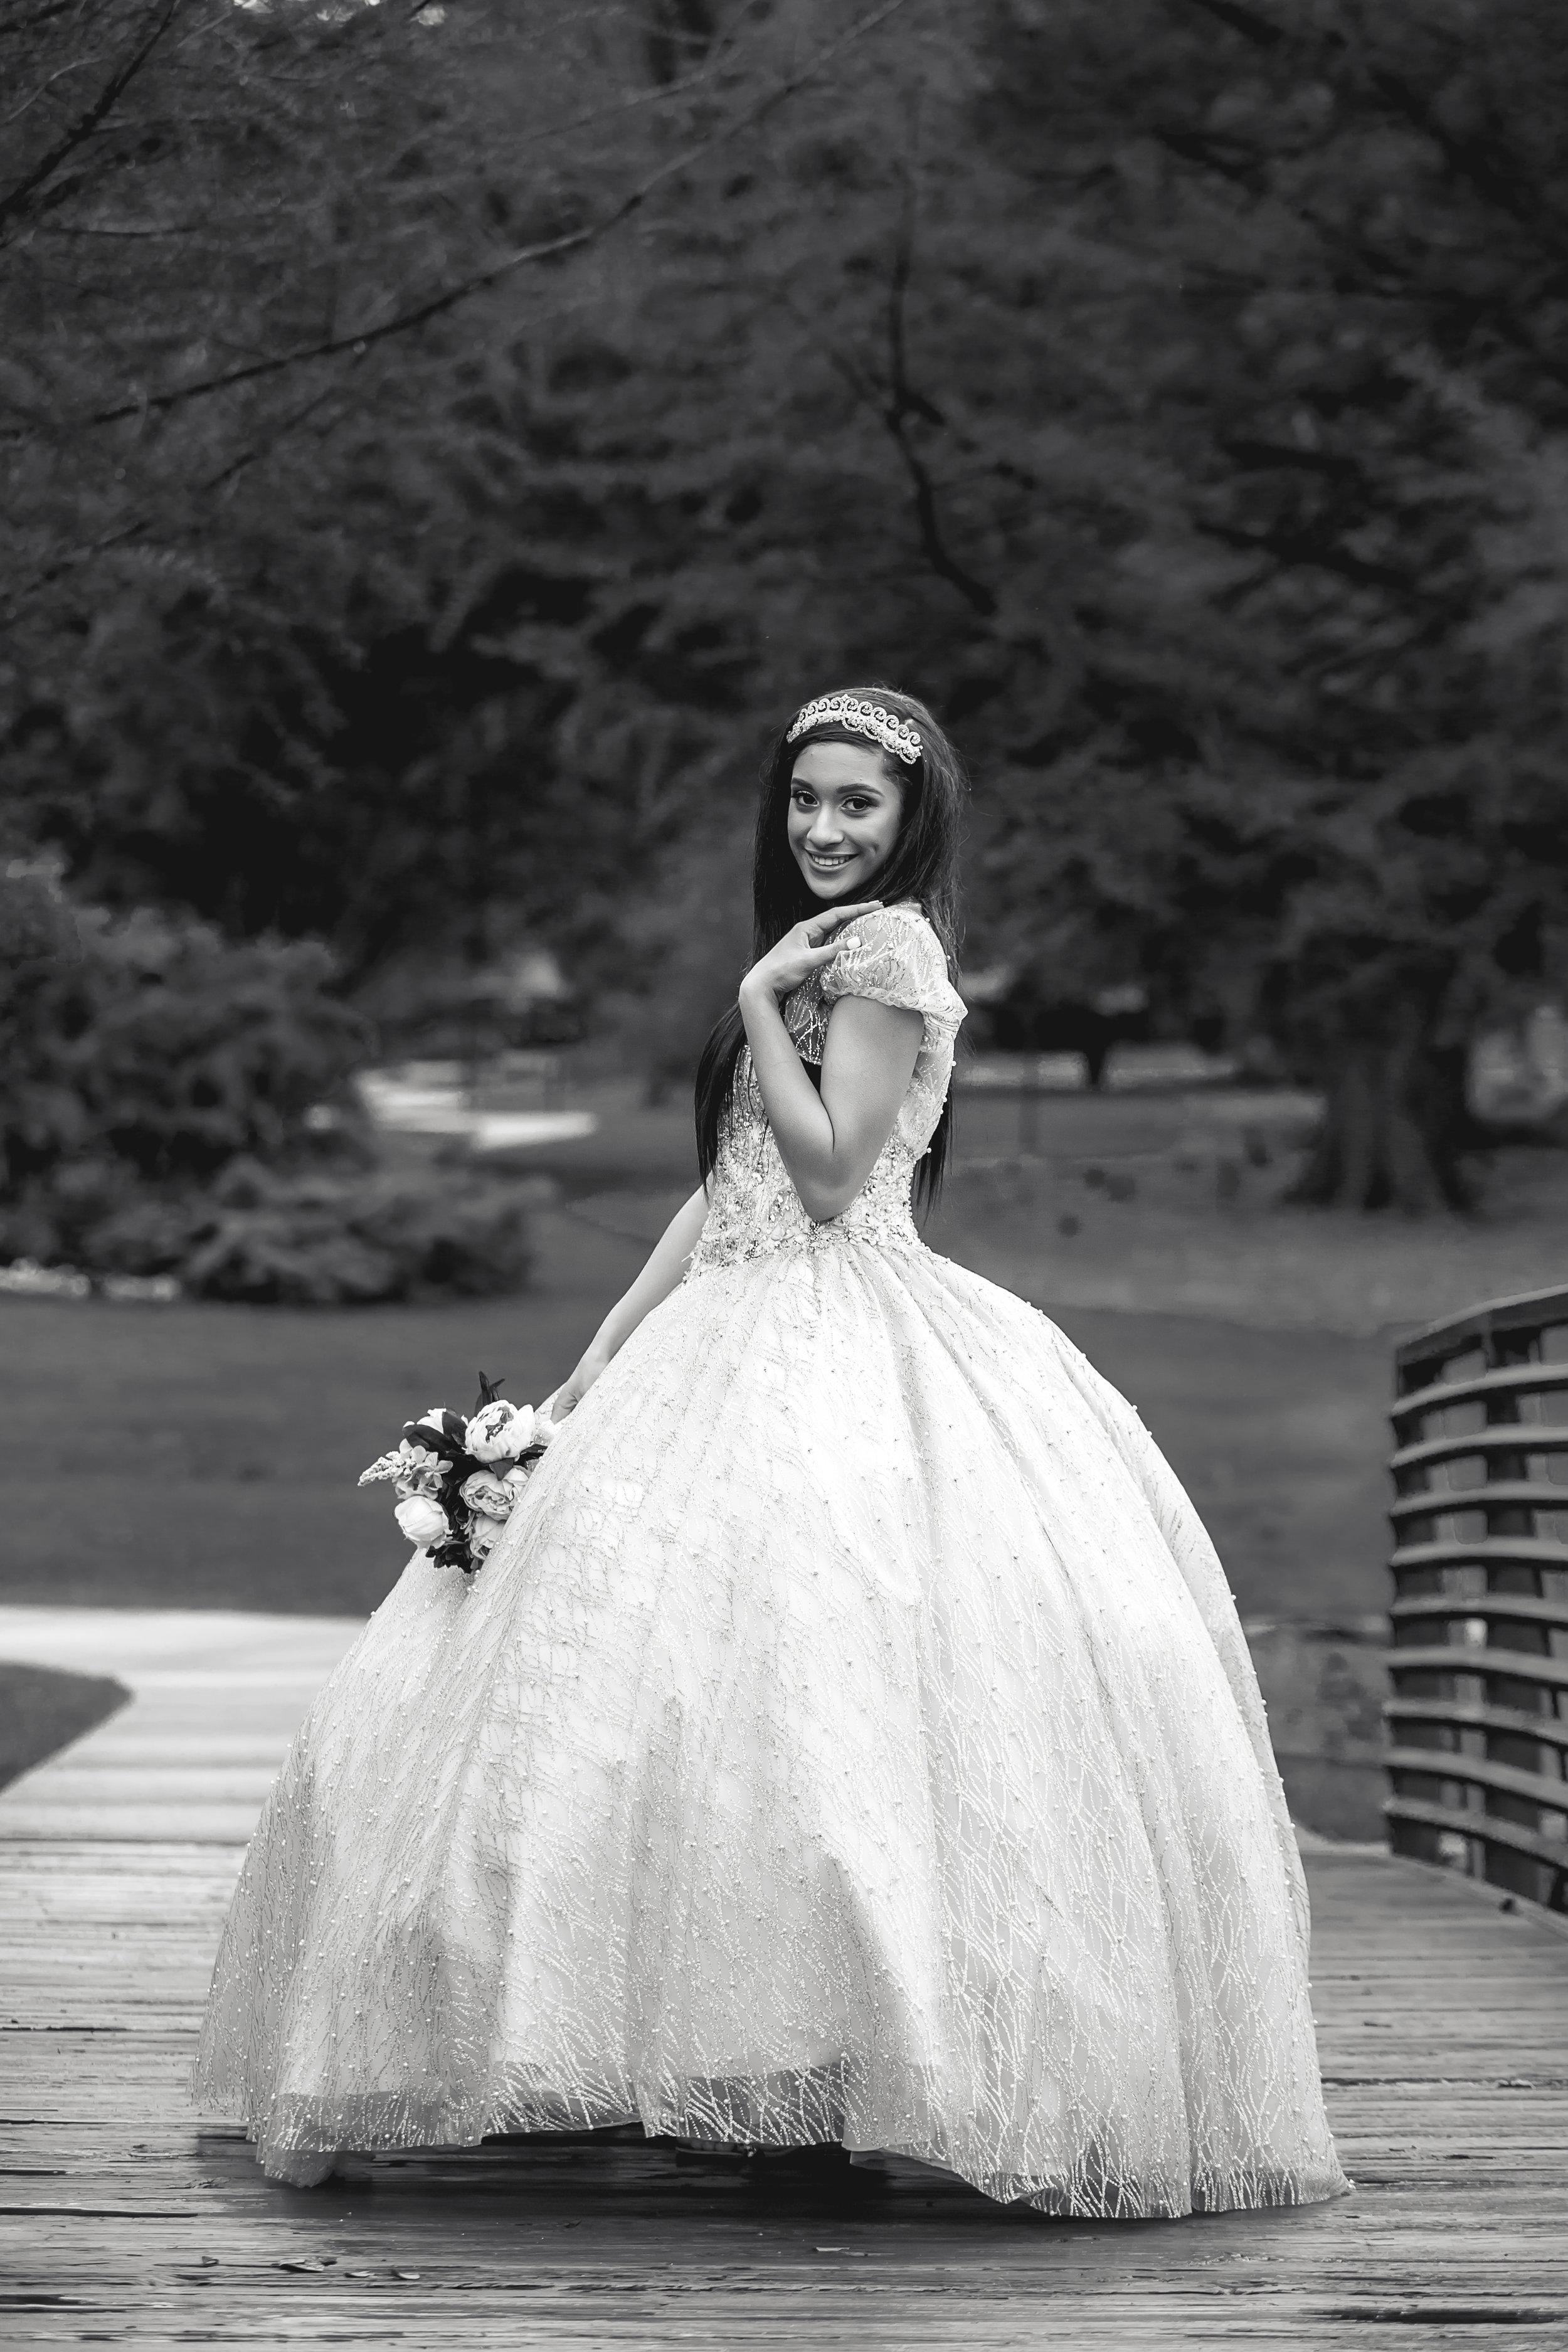 charlotte north carolina wedding portrait photographers quinceanera glencairn gardens